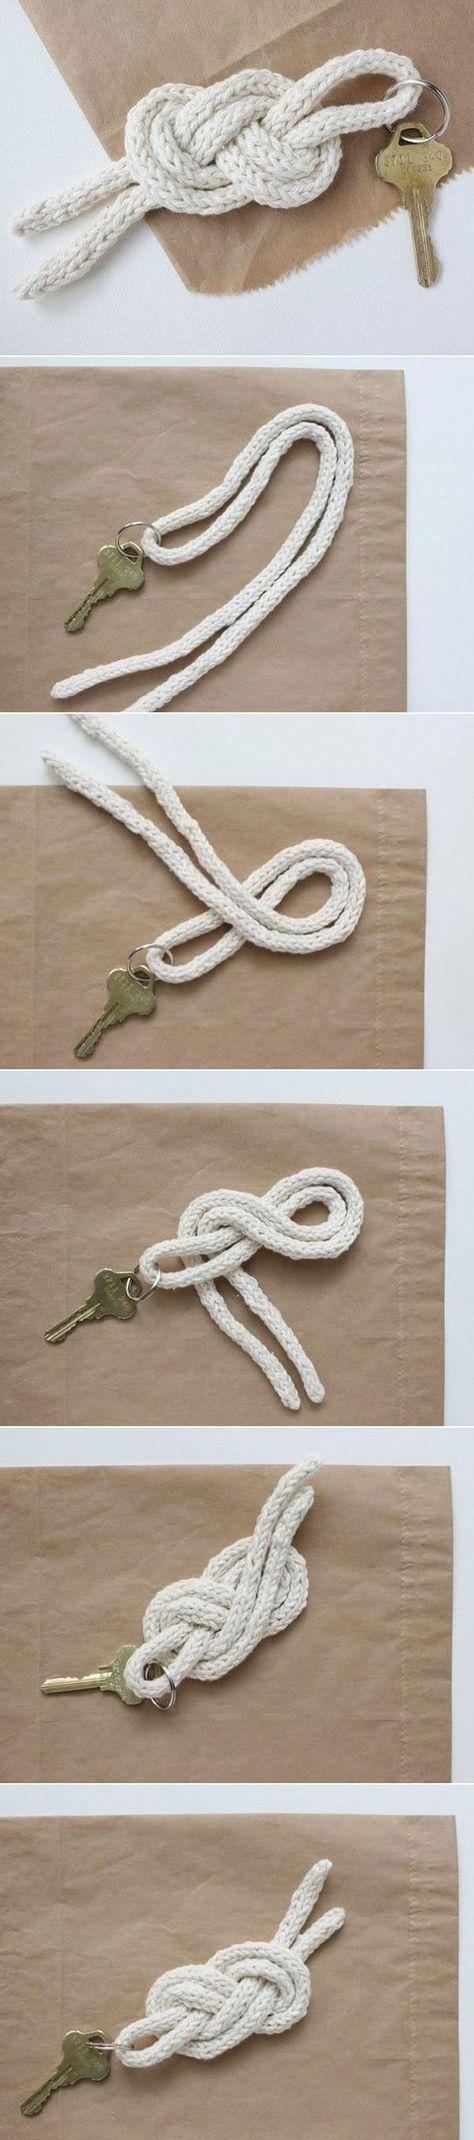 Knoten-Schlüsselanhänger